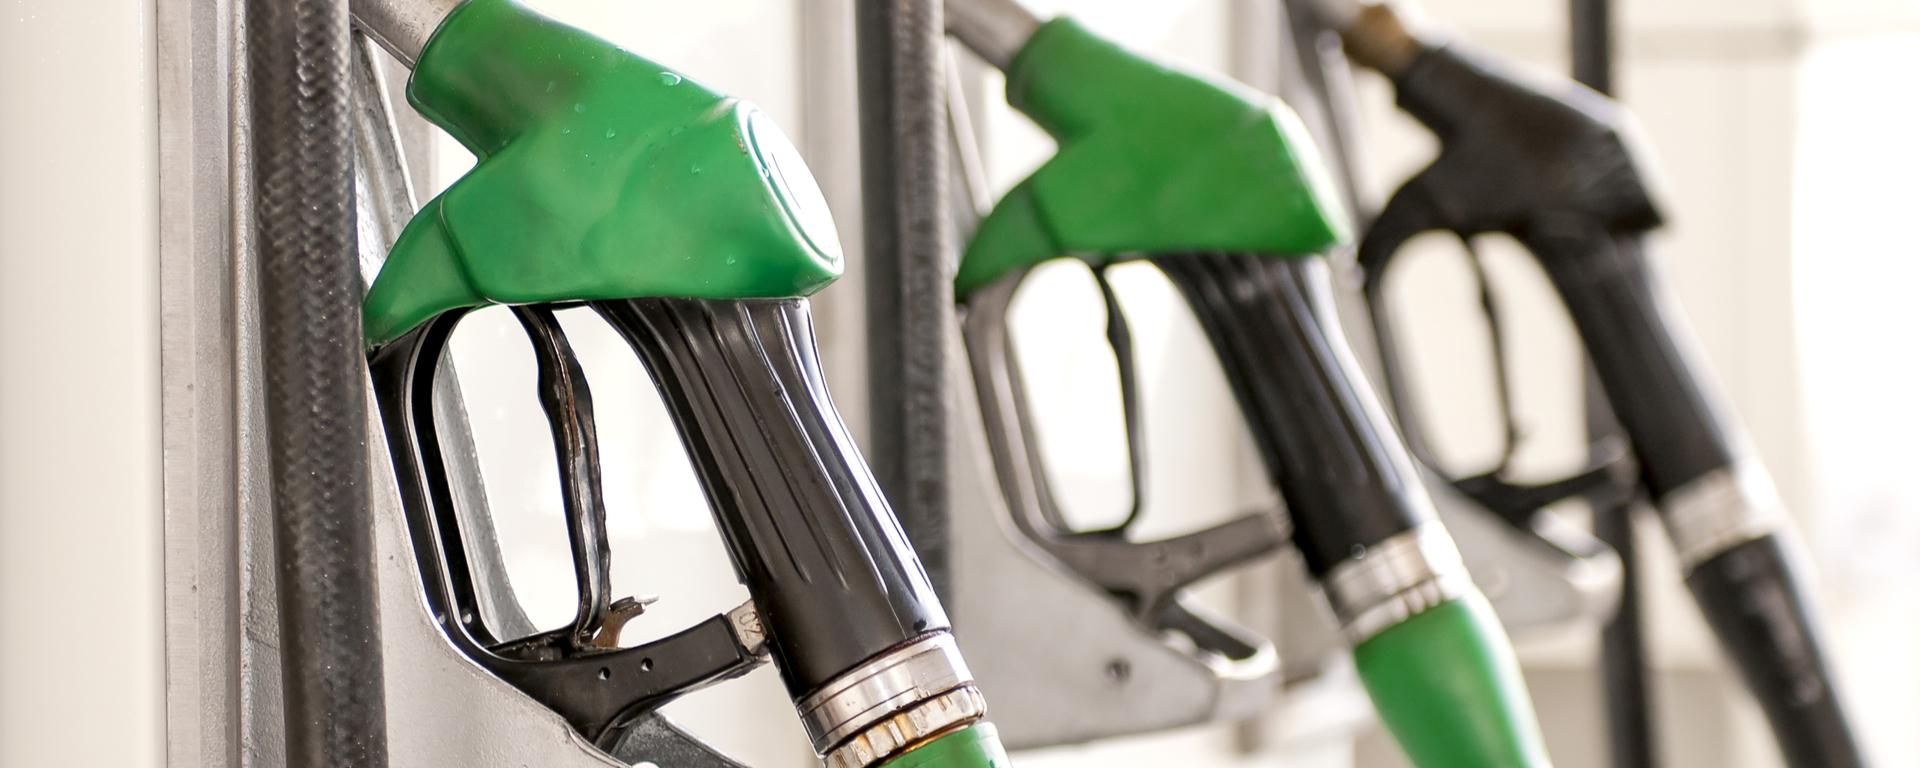 E10 petrol compatibility